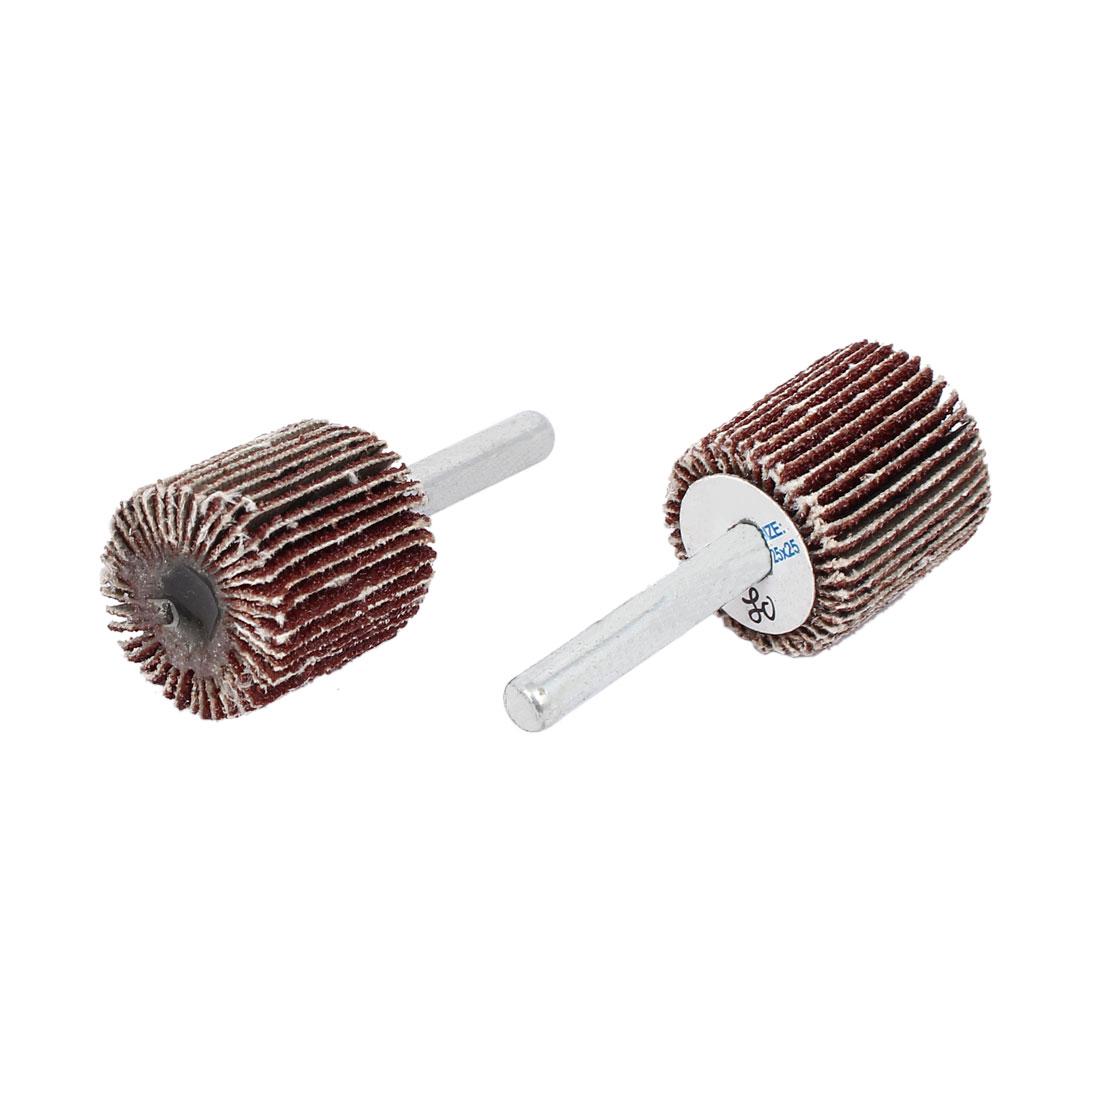 6mmx25mmx25mm Cylinder Head Flap Wheels Polishers Sanding Buffing Tools 2pcs